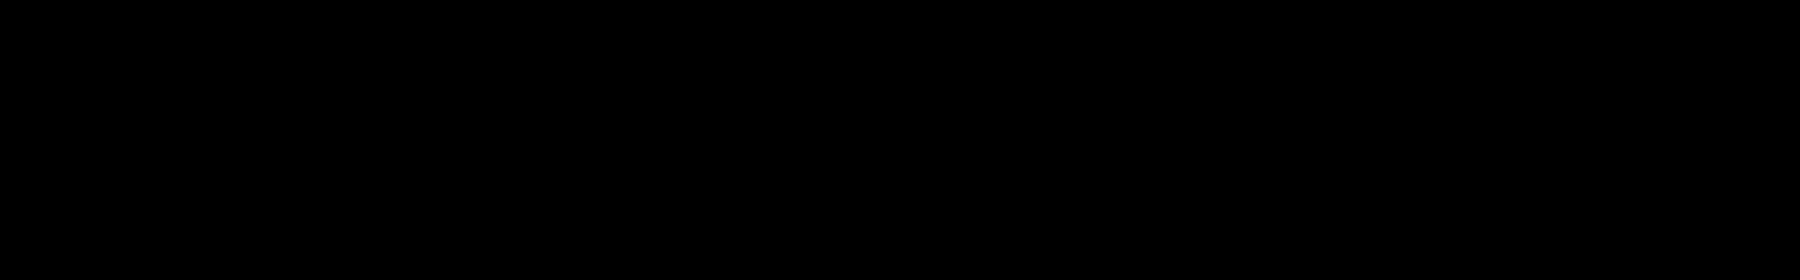 Rift - Dark Trip Hop Loops audio waveform